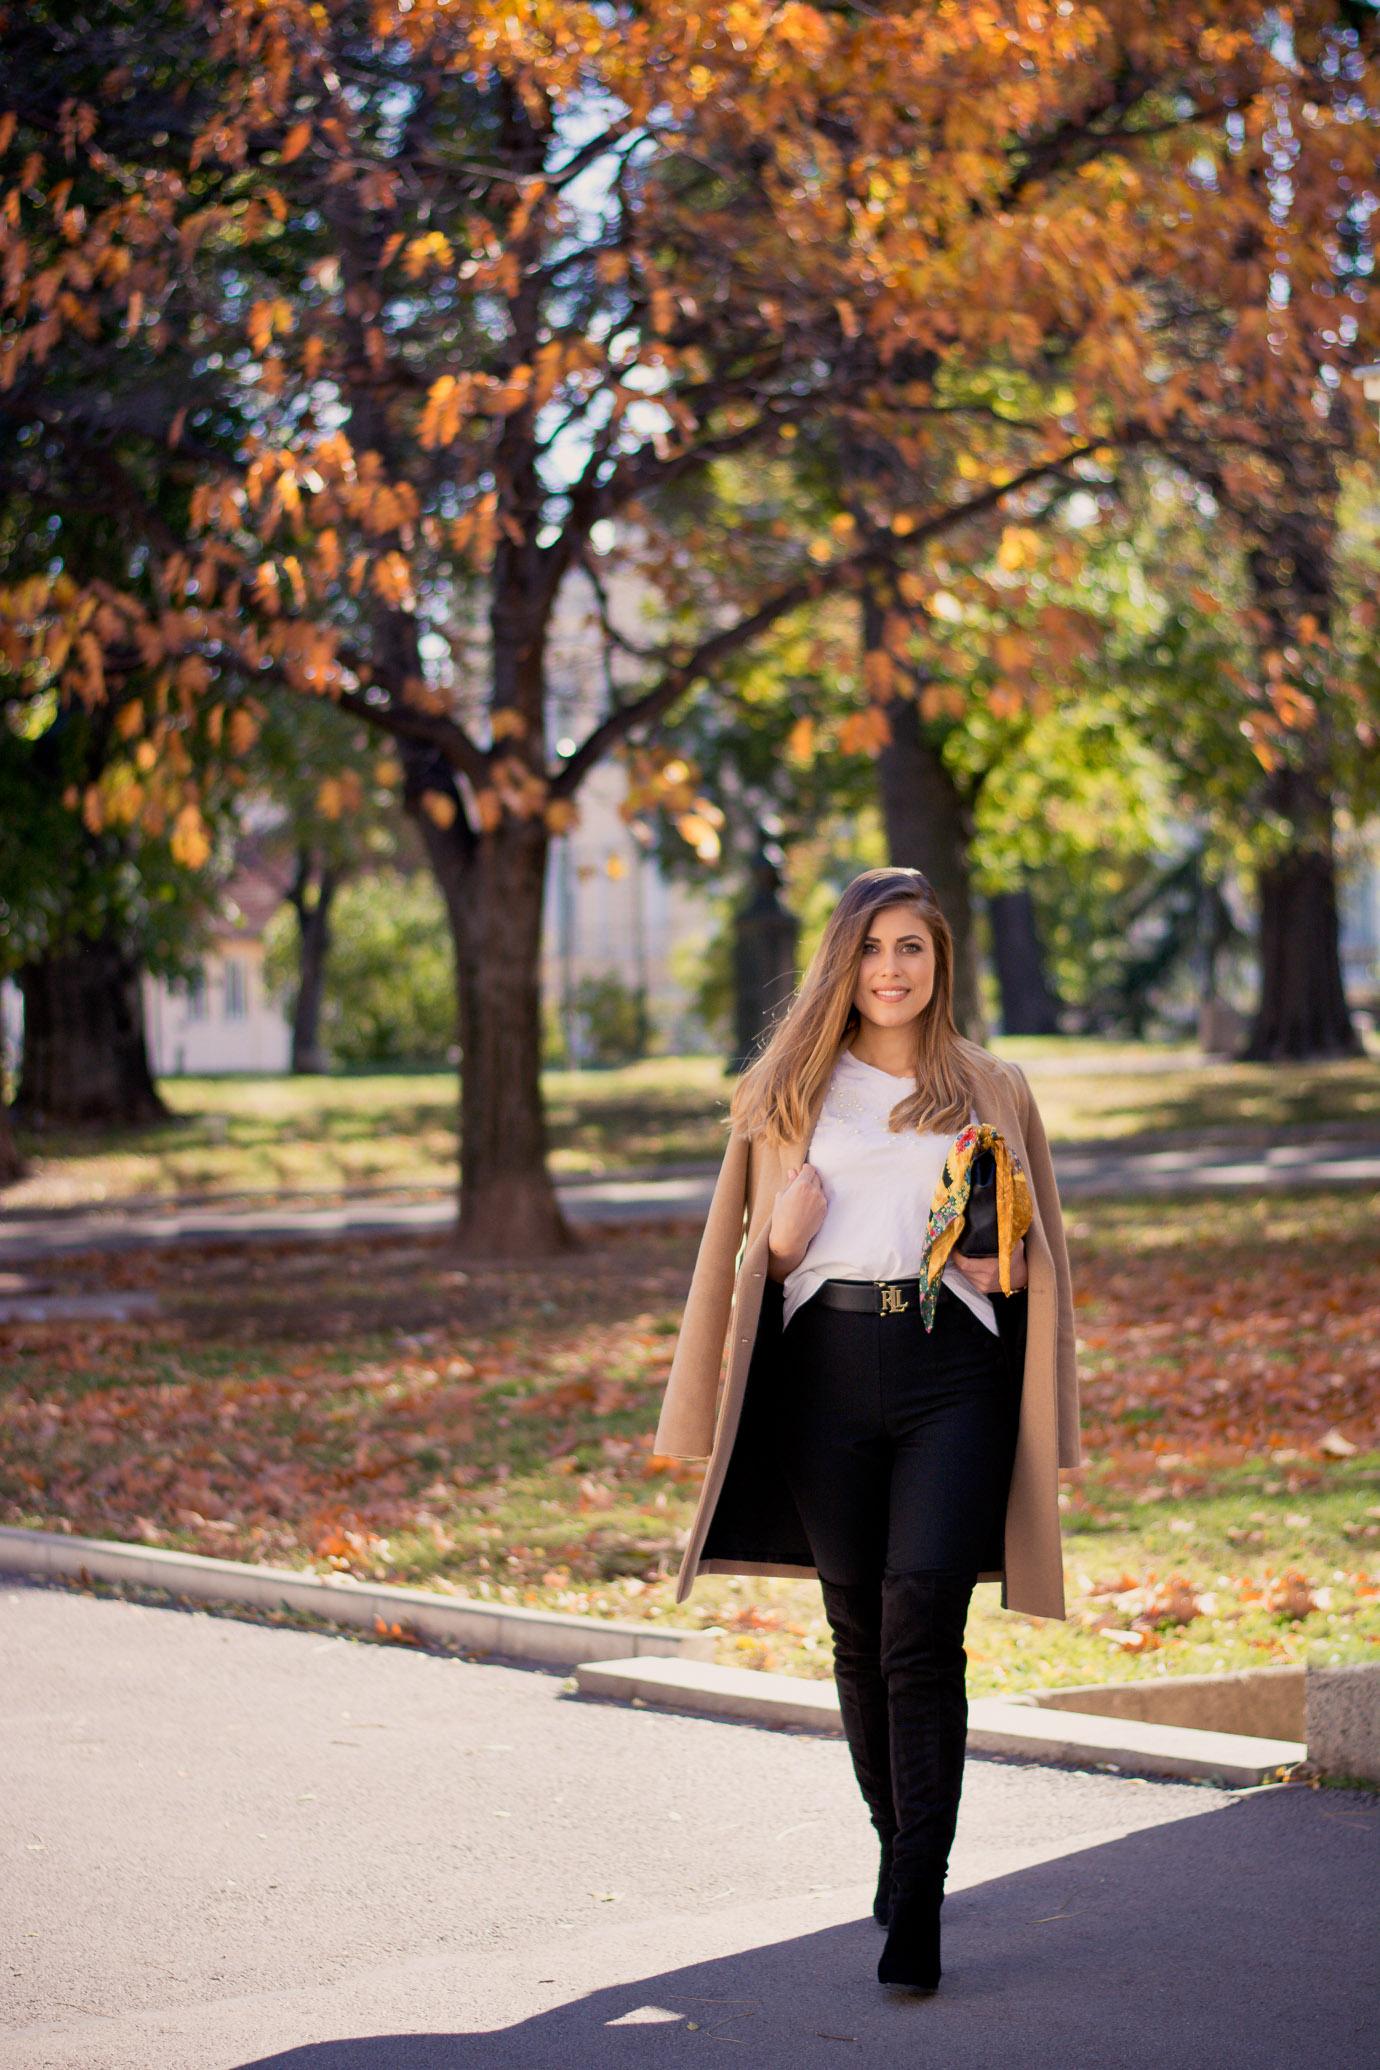 Estee lauder Autumn LA make up look